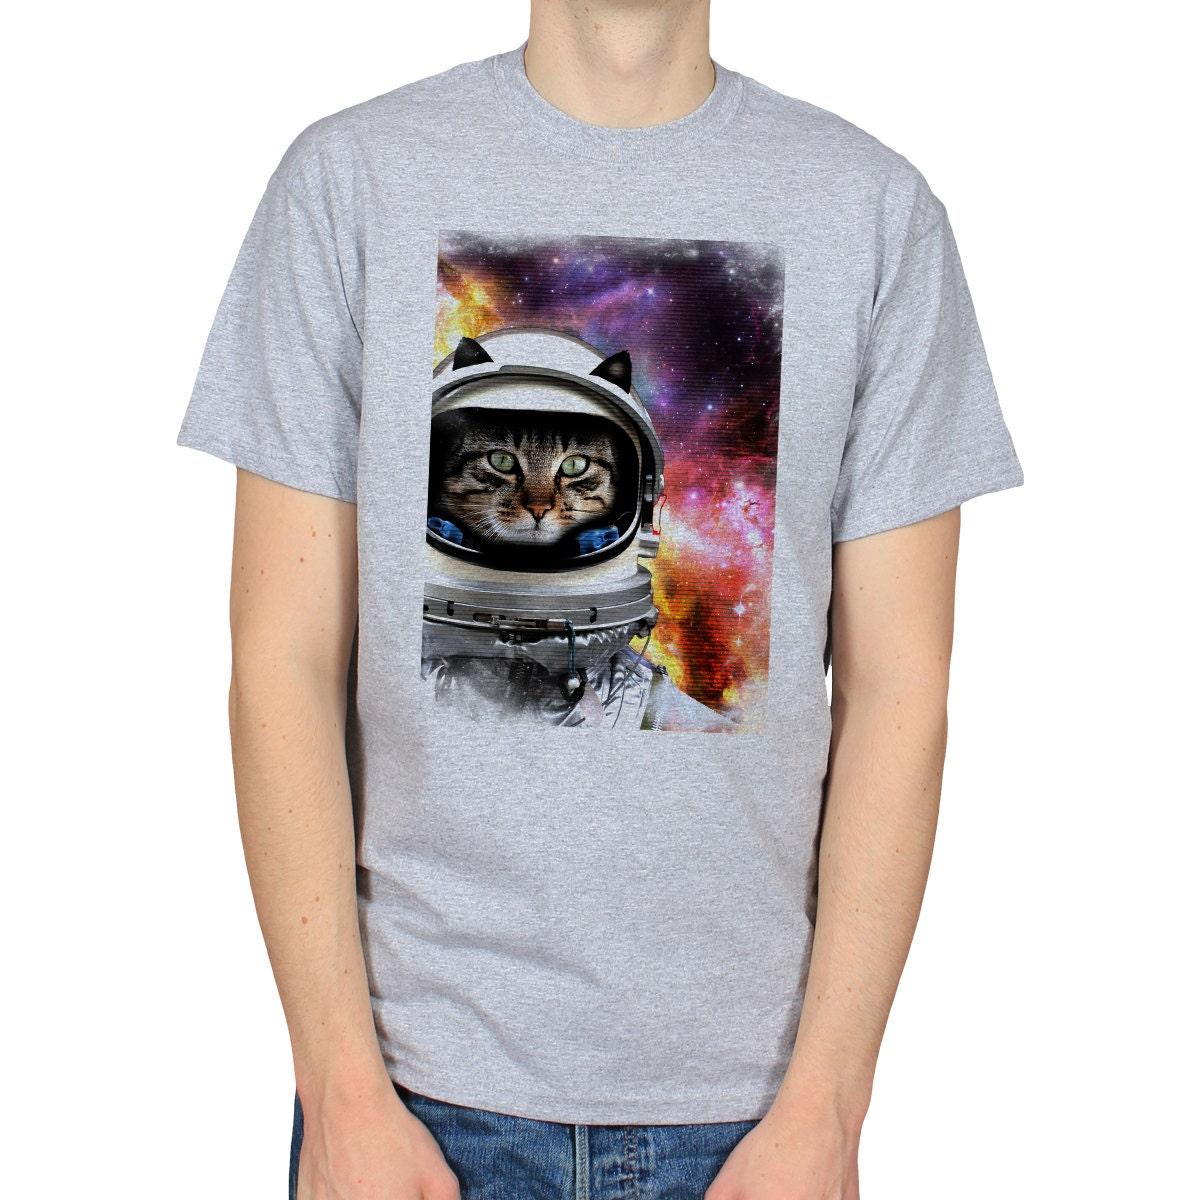 astronaut space t shirt - photo #7